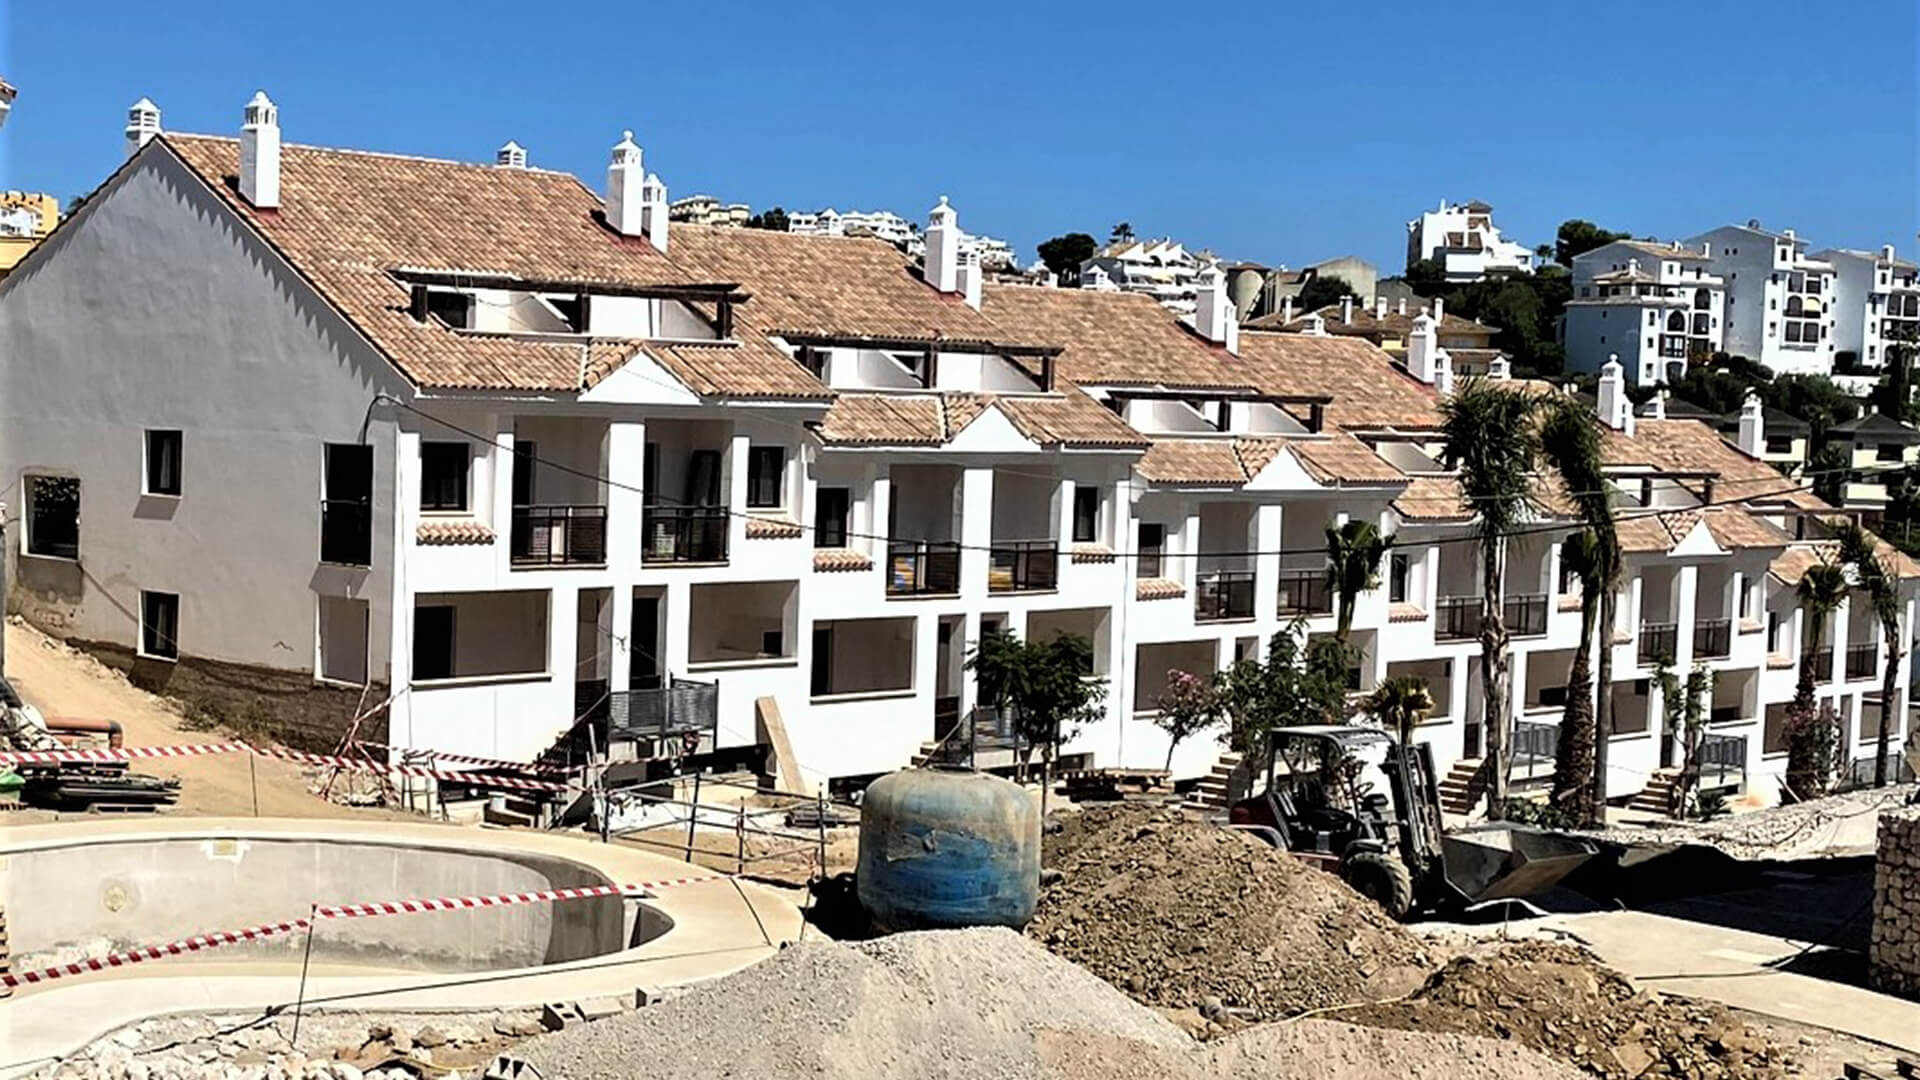 Riviera Homes - Riviera del Sol